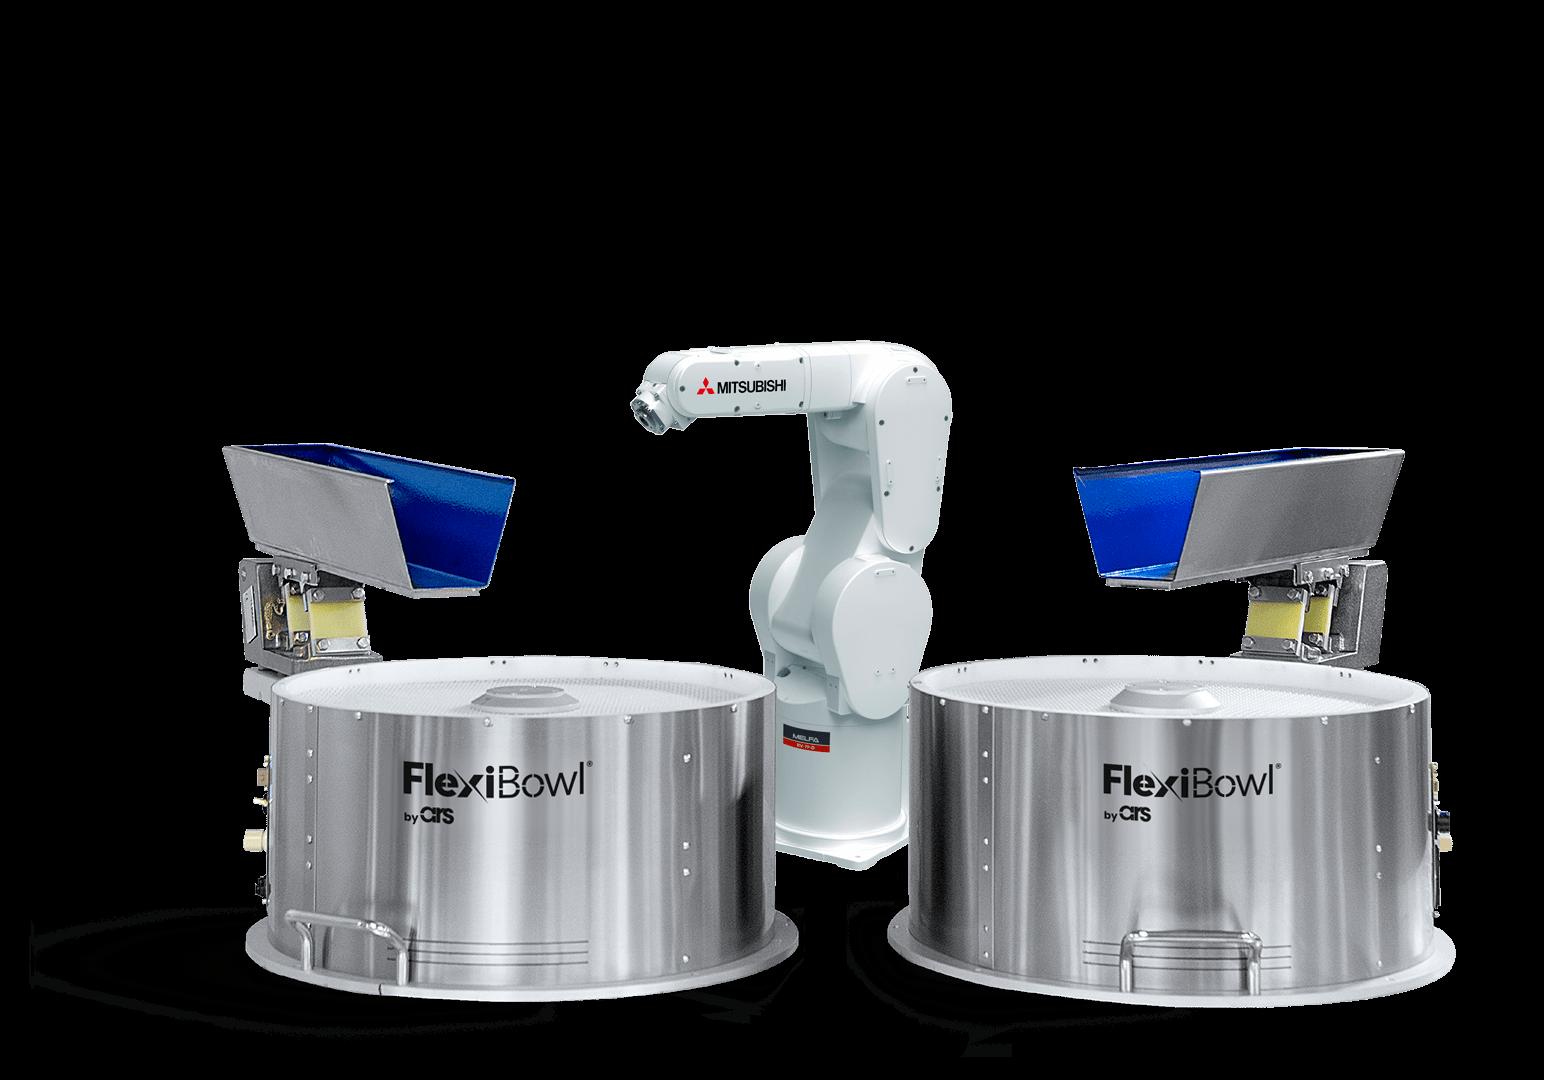 FLEXI-EASY - MITSUBISHI ROBOT